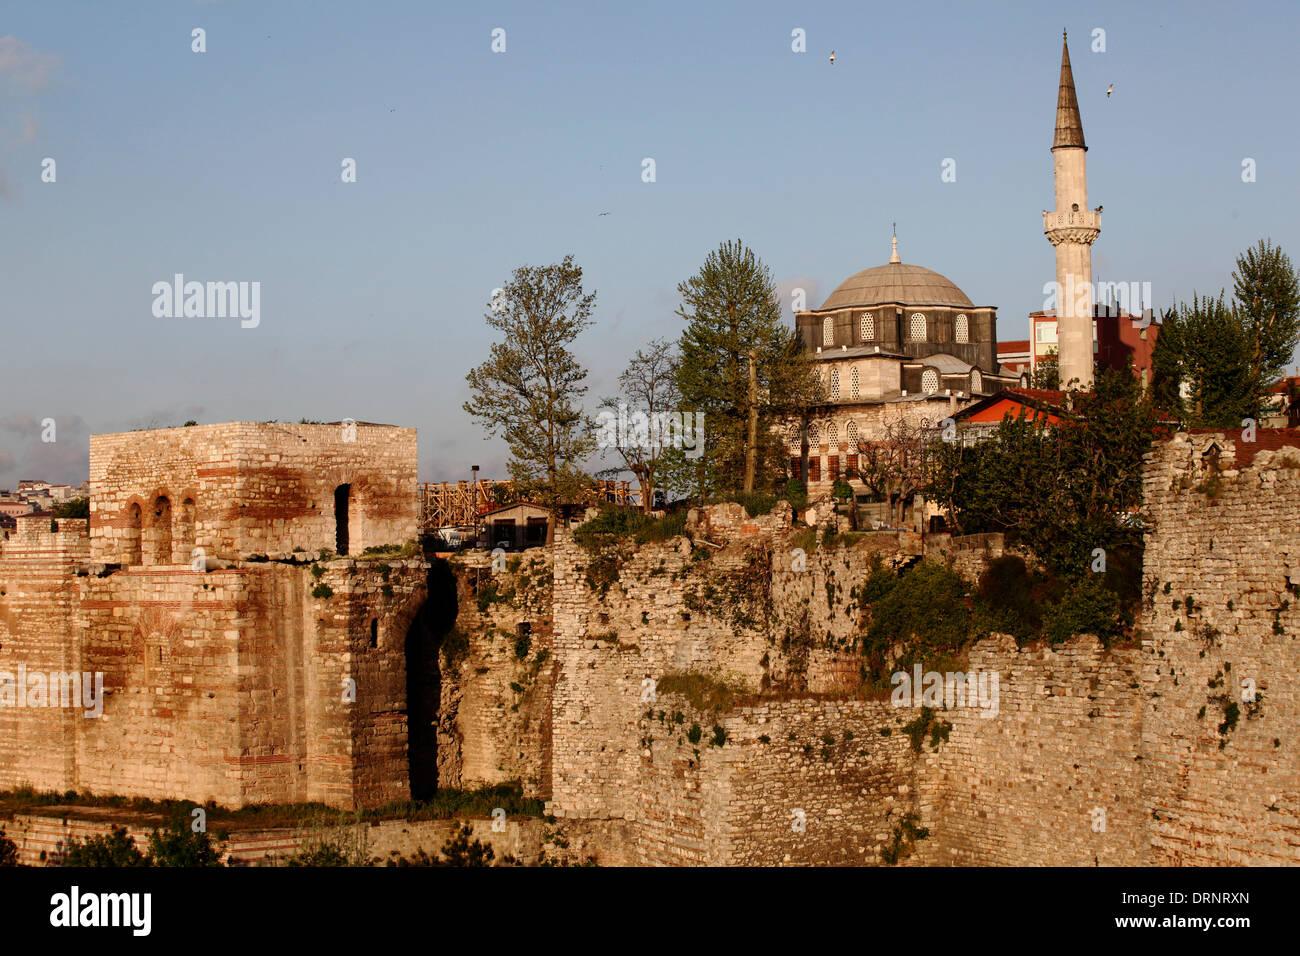 Historischen Istanbul Festung Türkei Stockbild